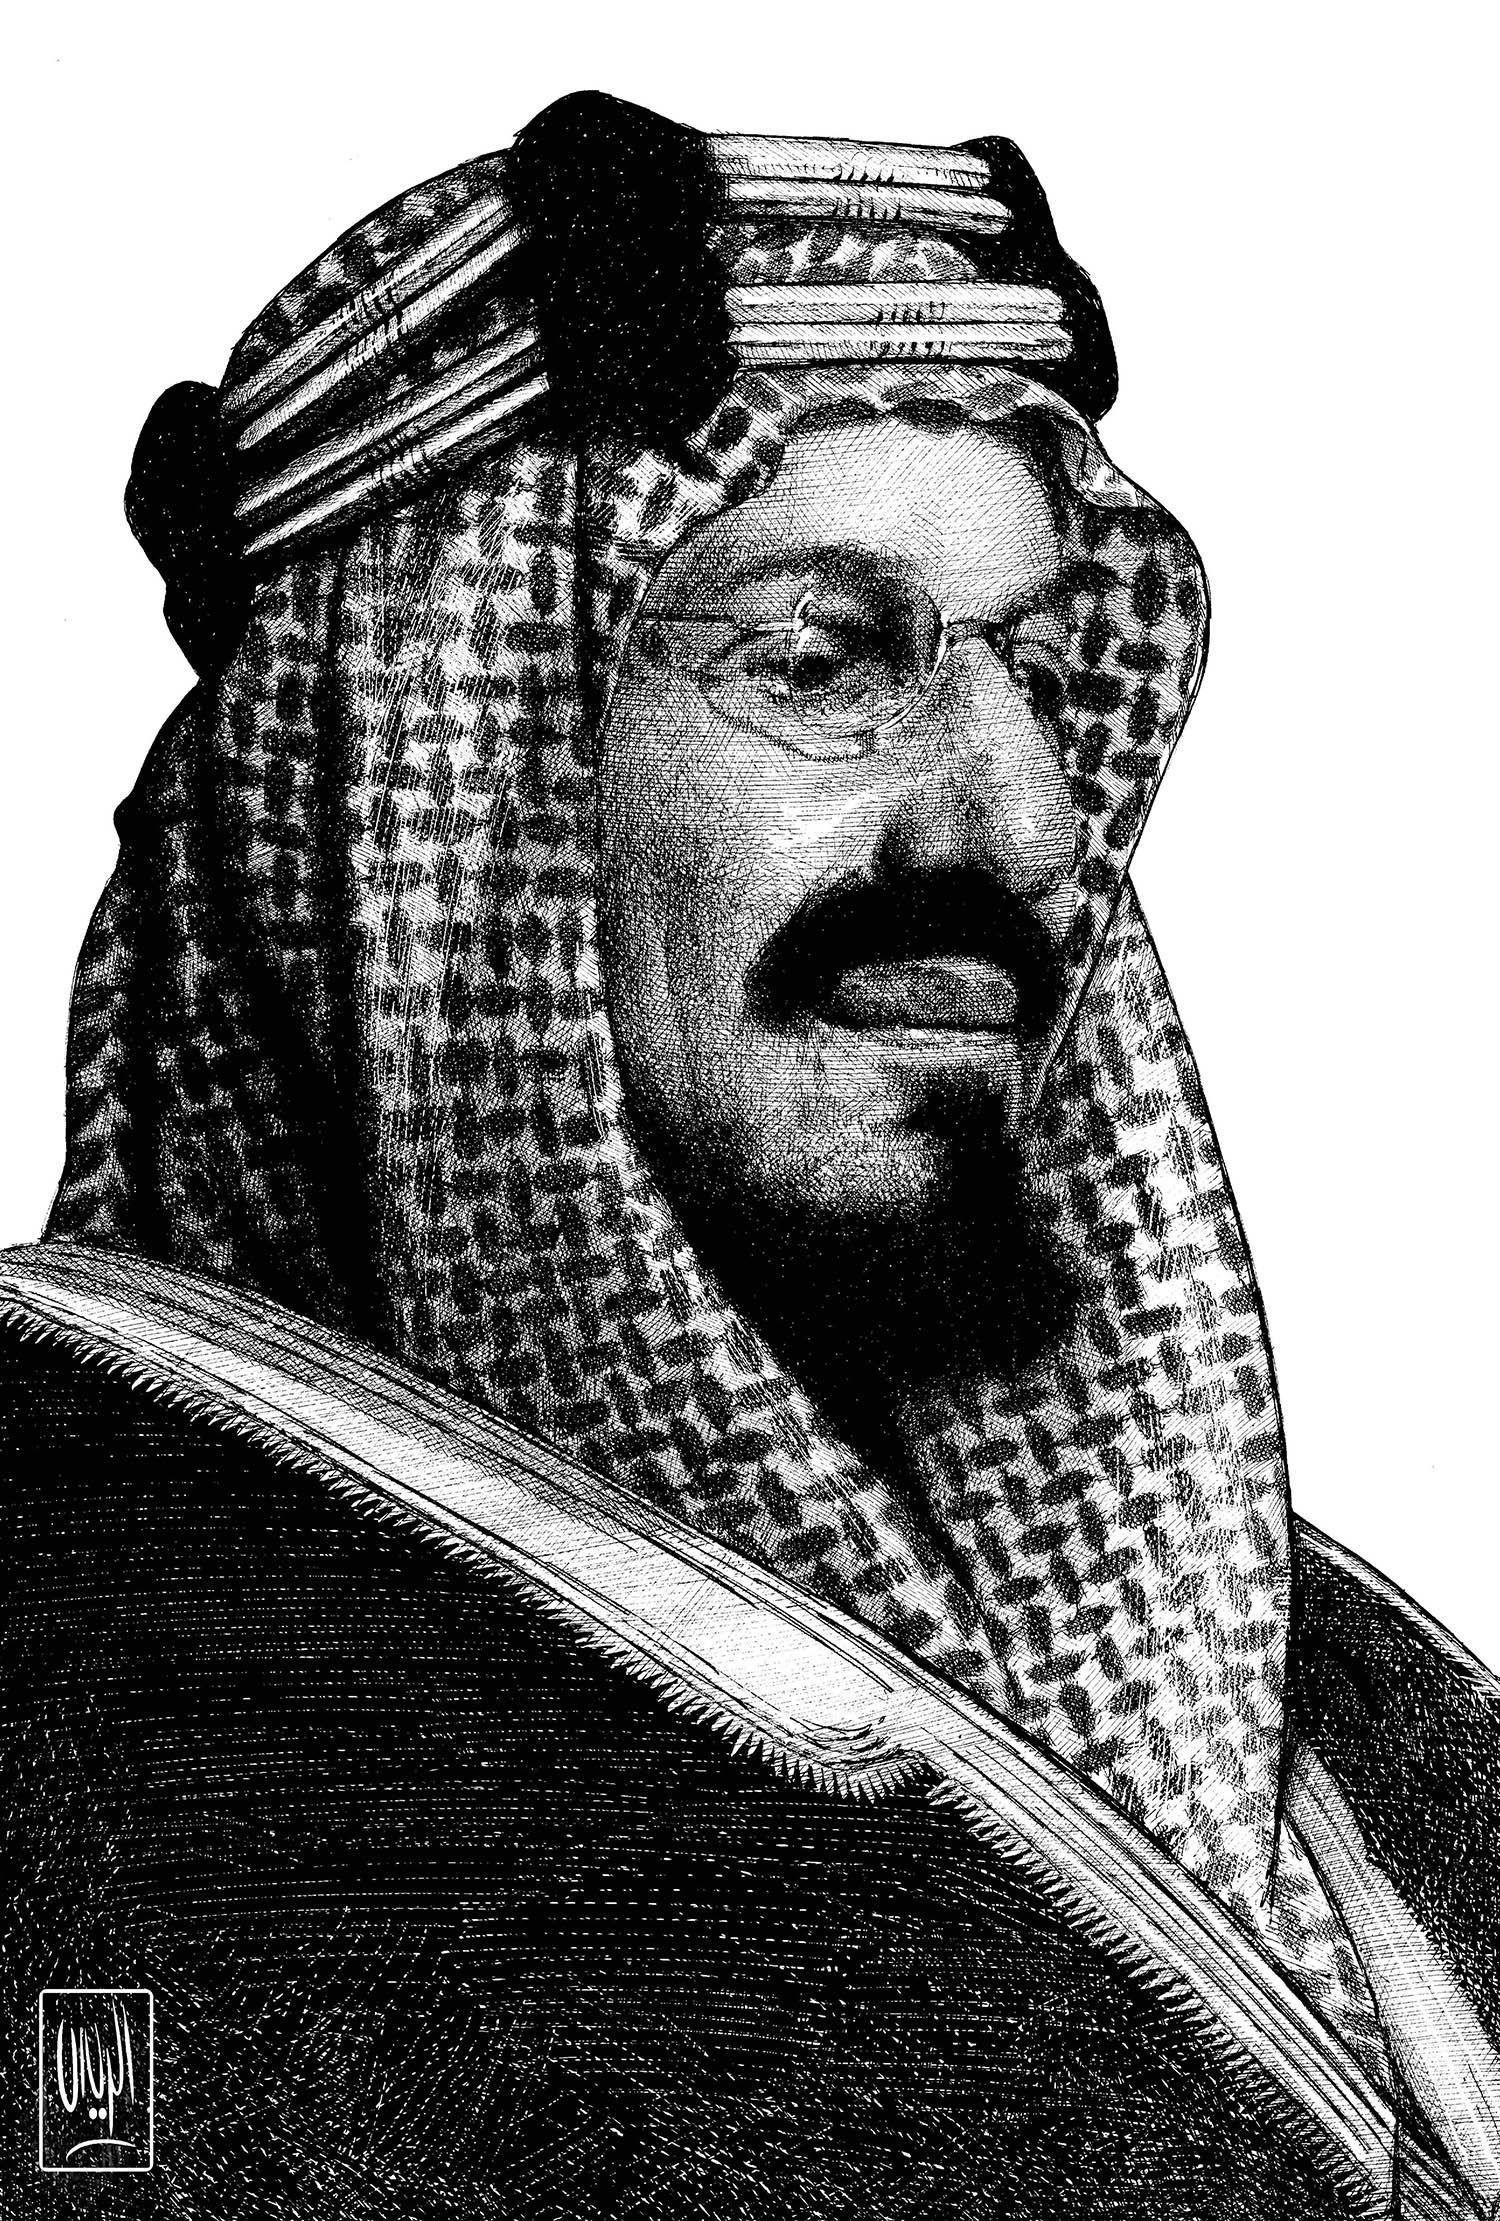 King Abdulaziz Saudi Arabia Culture Saudi Arabia Flag King Salman Saudi Arabia